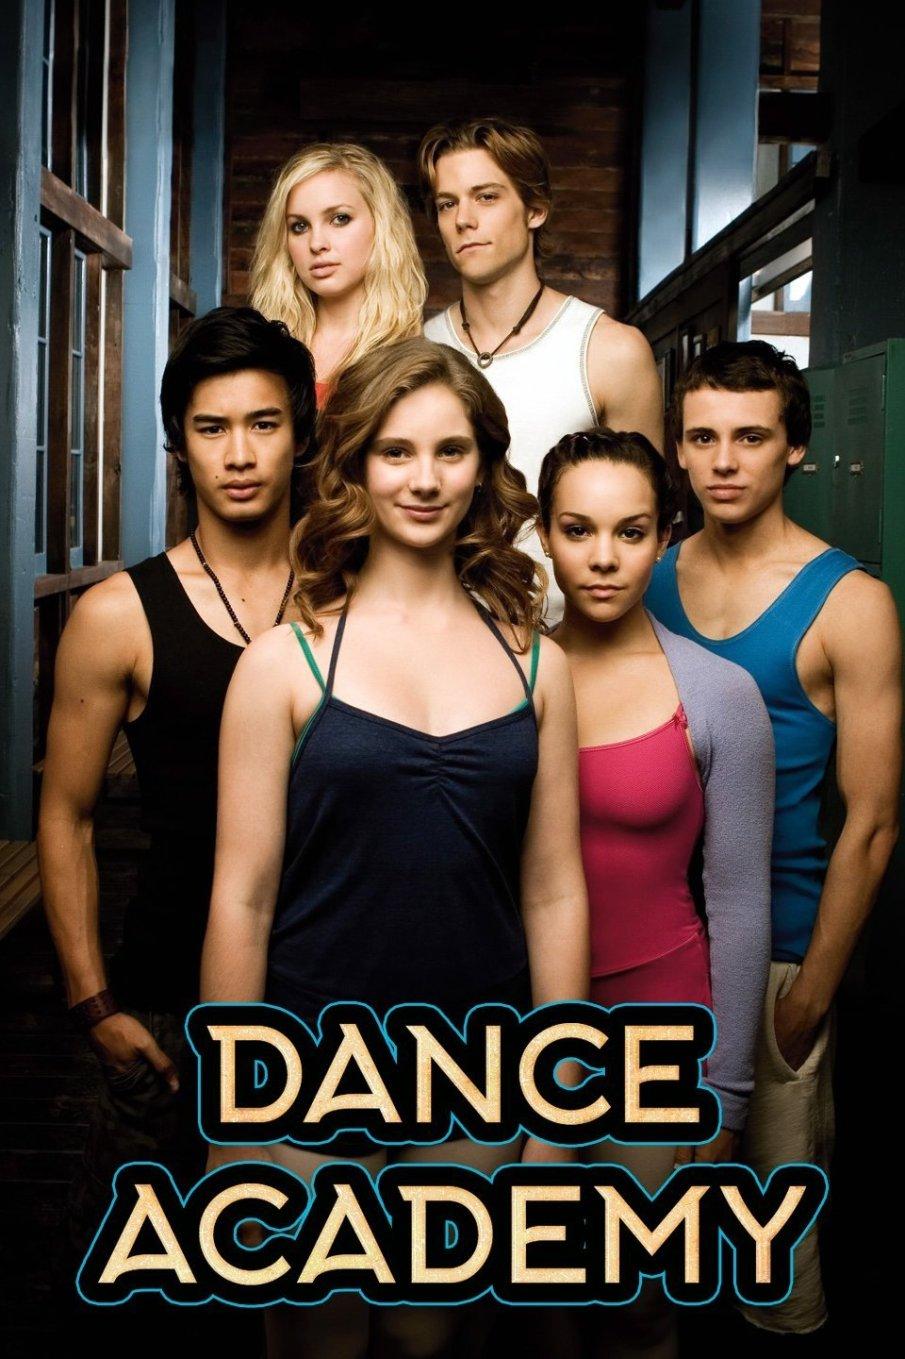 Dance aca